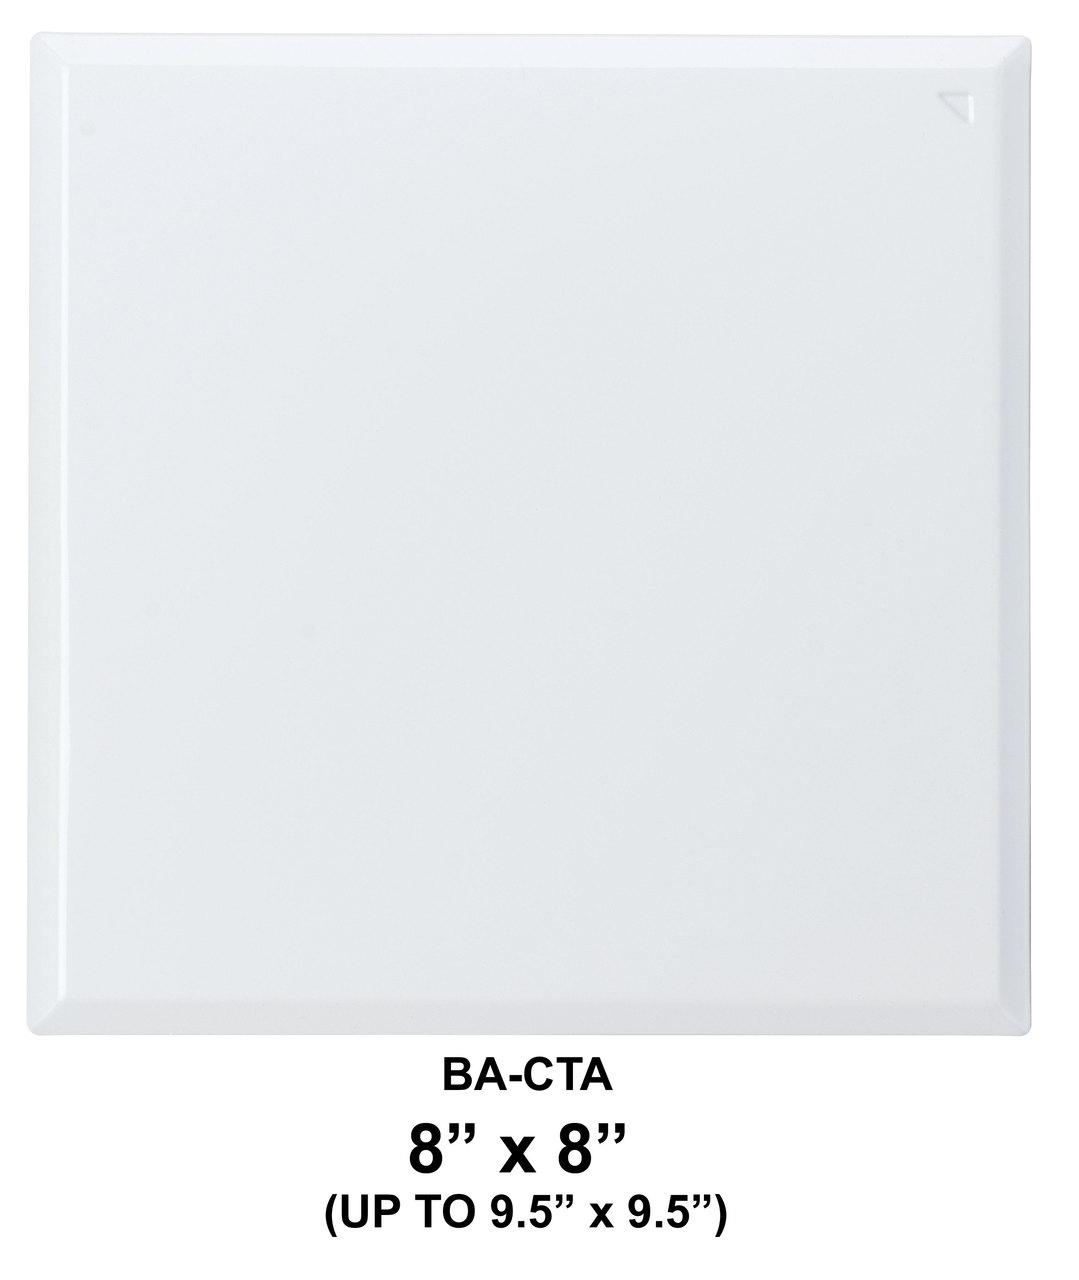 Access Doors BA-CTA 8 x 8 Removeable / Adjustable Access Panel - BEST